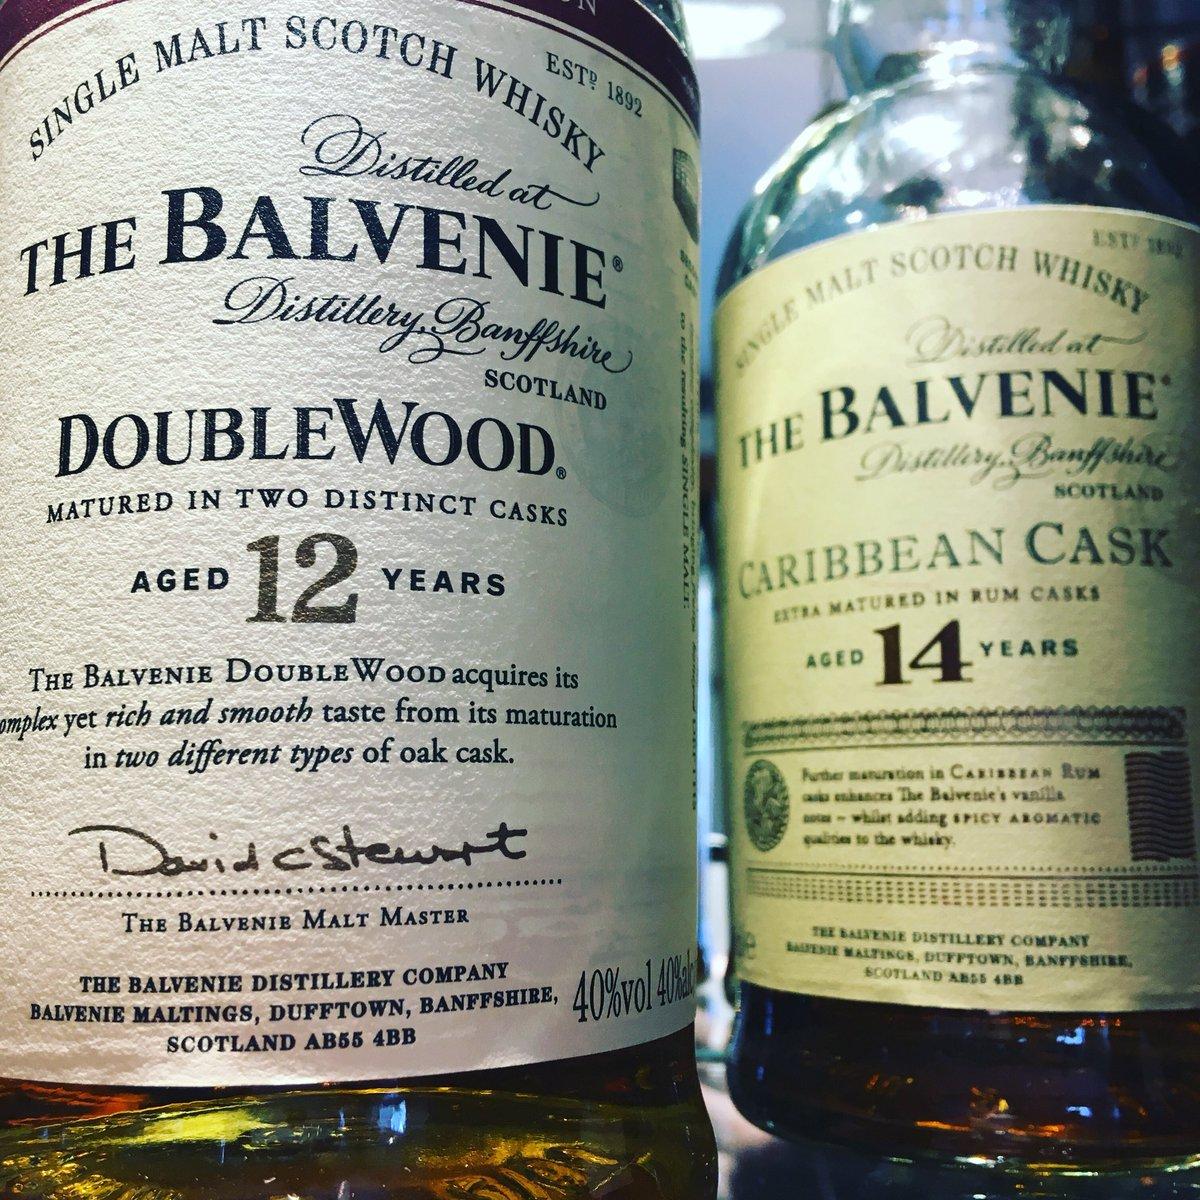 RT @EddMather: RT @HOS_Hudds: Wednesday whisky? Why not! Which whisky will u want? #headofsteamhuddersfield #tasty #whisky #balvenie #singlemaltwhisky